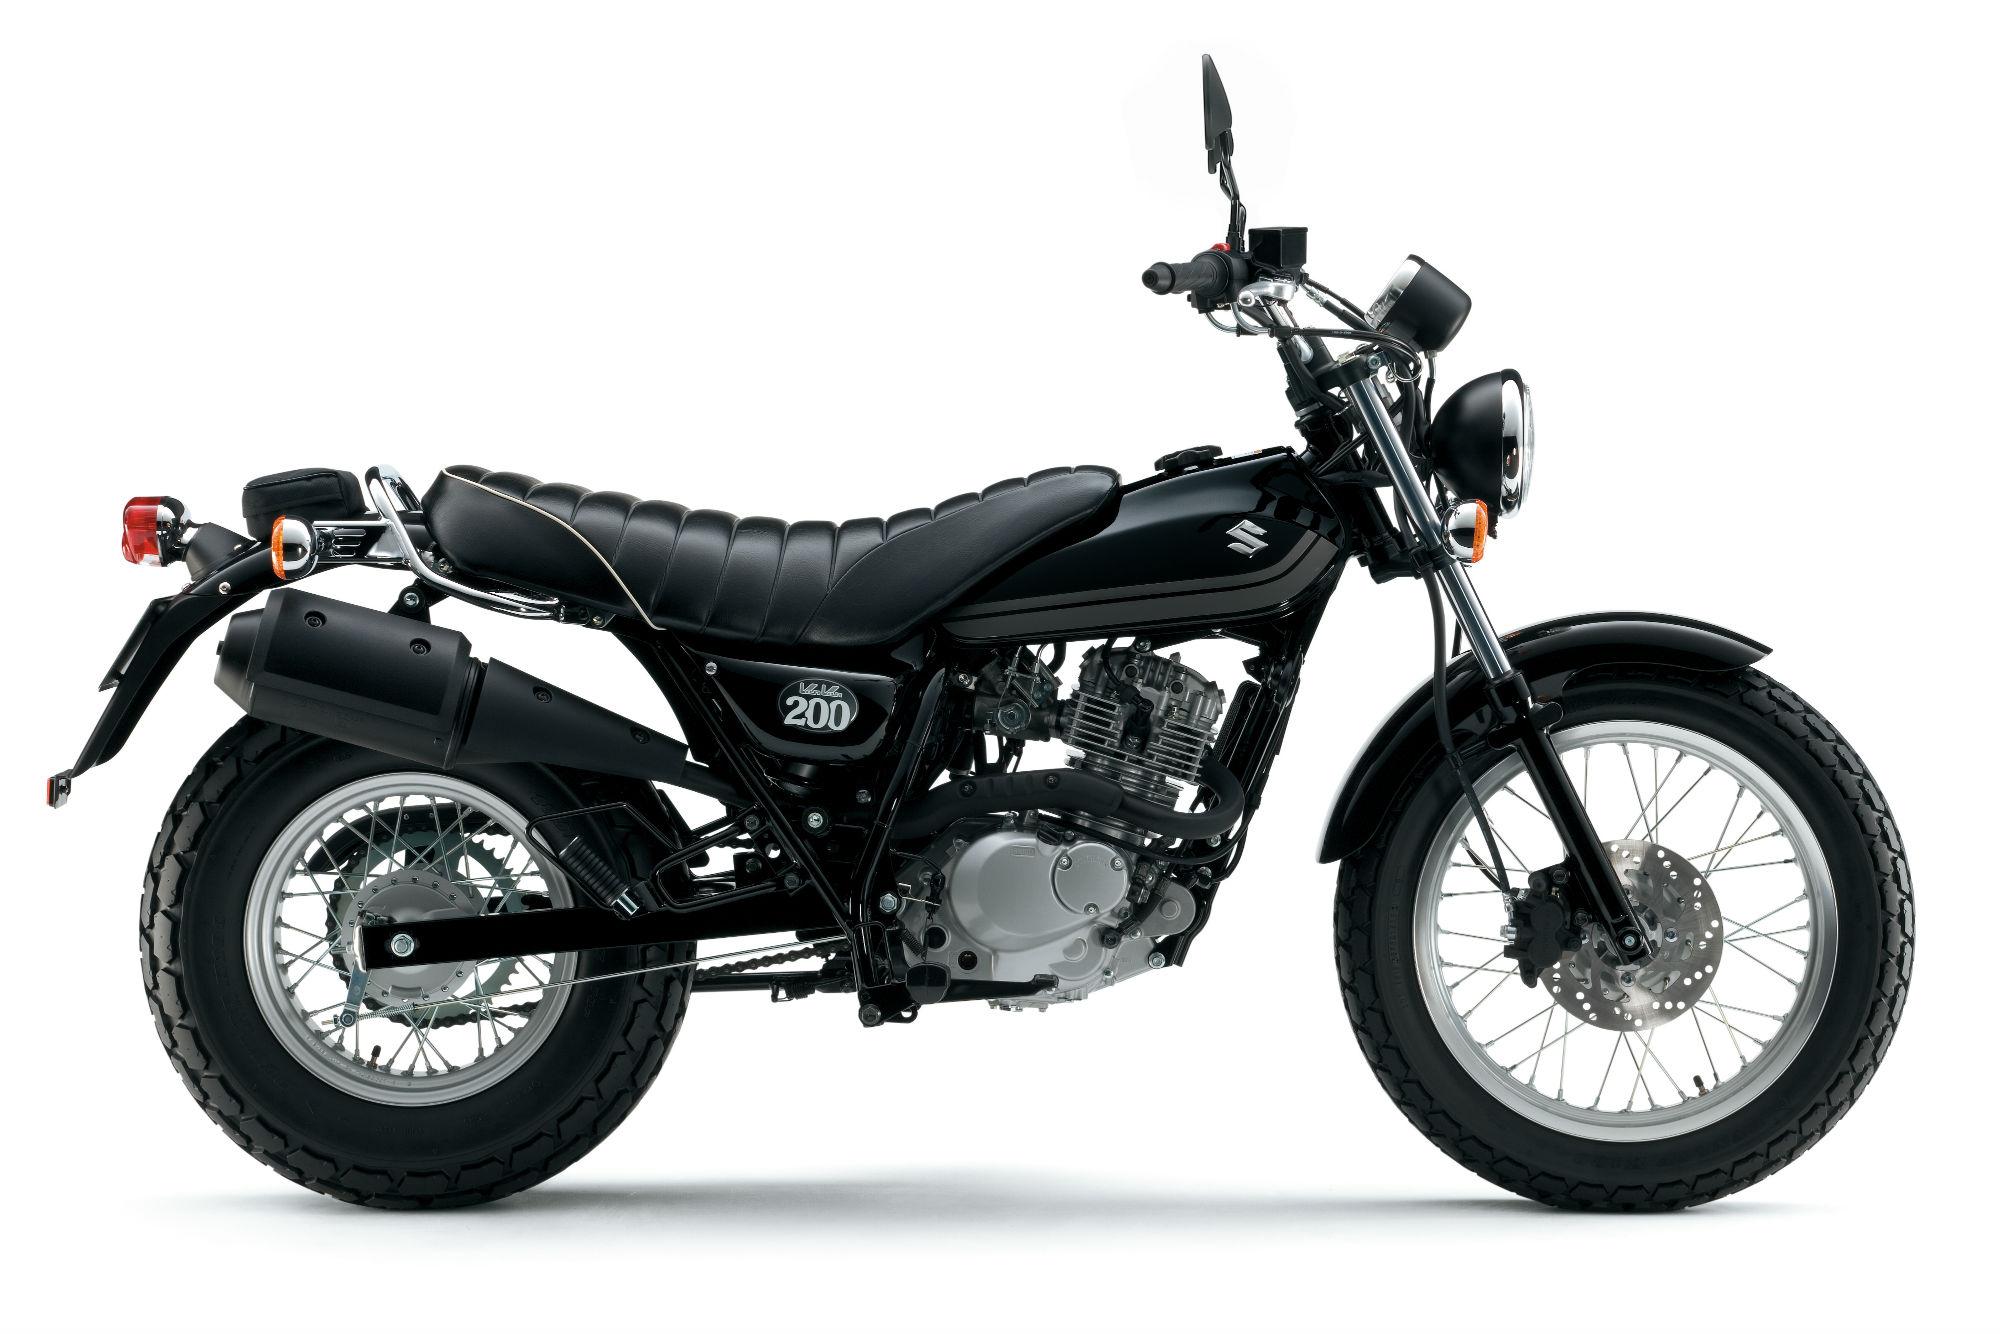 New Suzuki VanVan 200